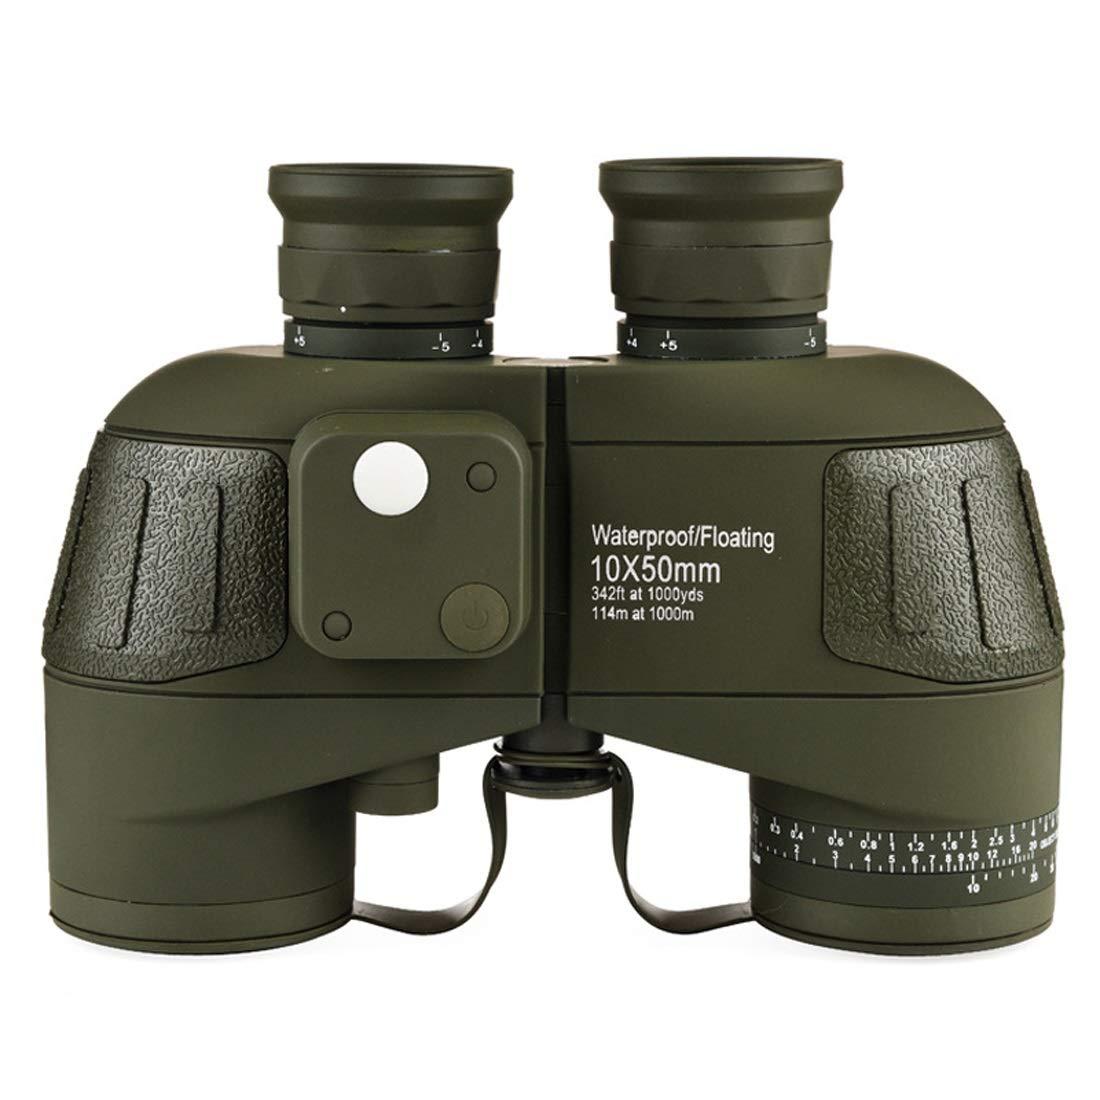 CAFUTY 大人のためのコンパス、コンパクトなHDプロフェッショナル双眼鏡のための10x50防曇双眼鏡BAK4プリズムFMCレンズ、屋外用 B07JZXNC9W